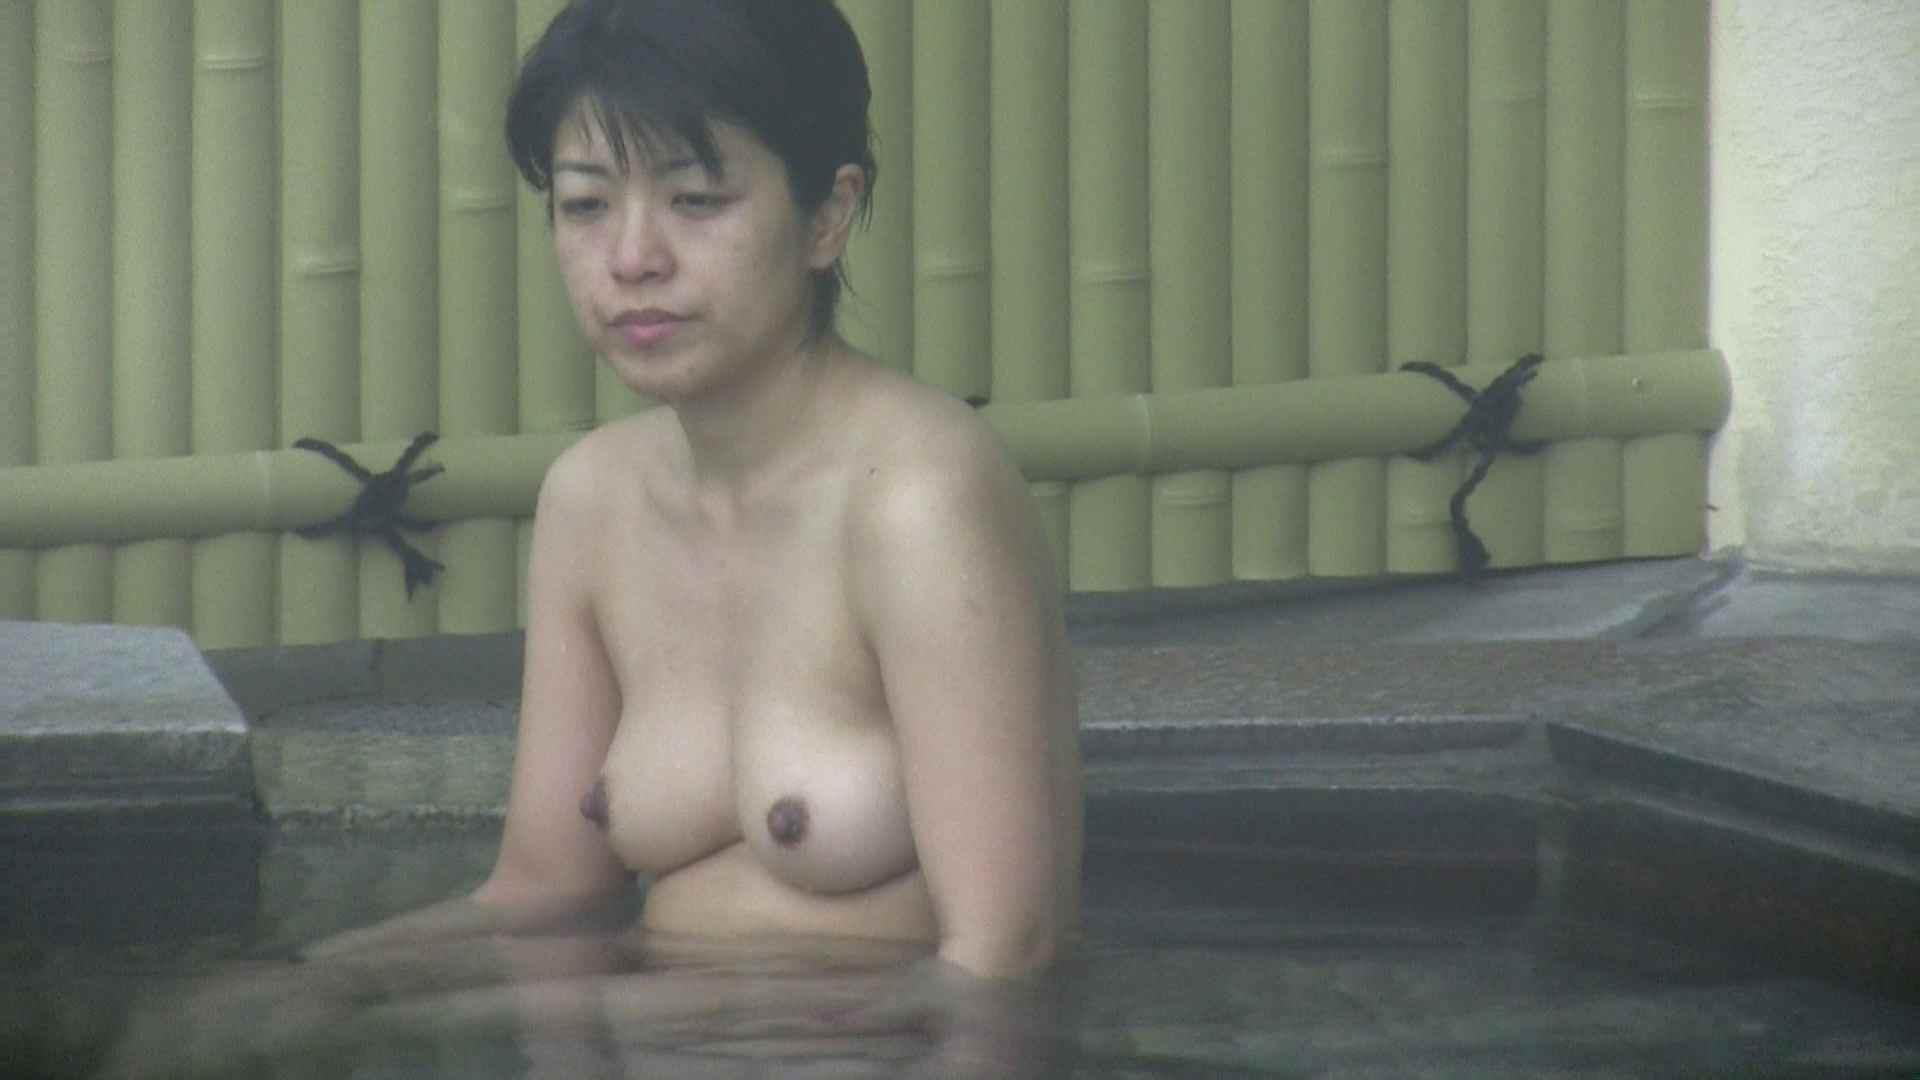 Aquaな露天風呂Vol.585 露天 オマンコ無修正動画無料 51画像 23